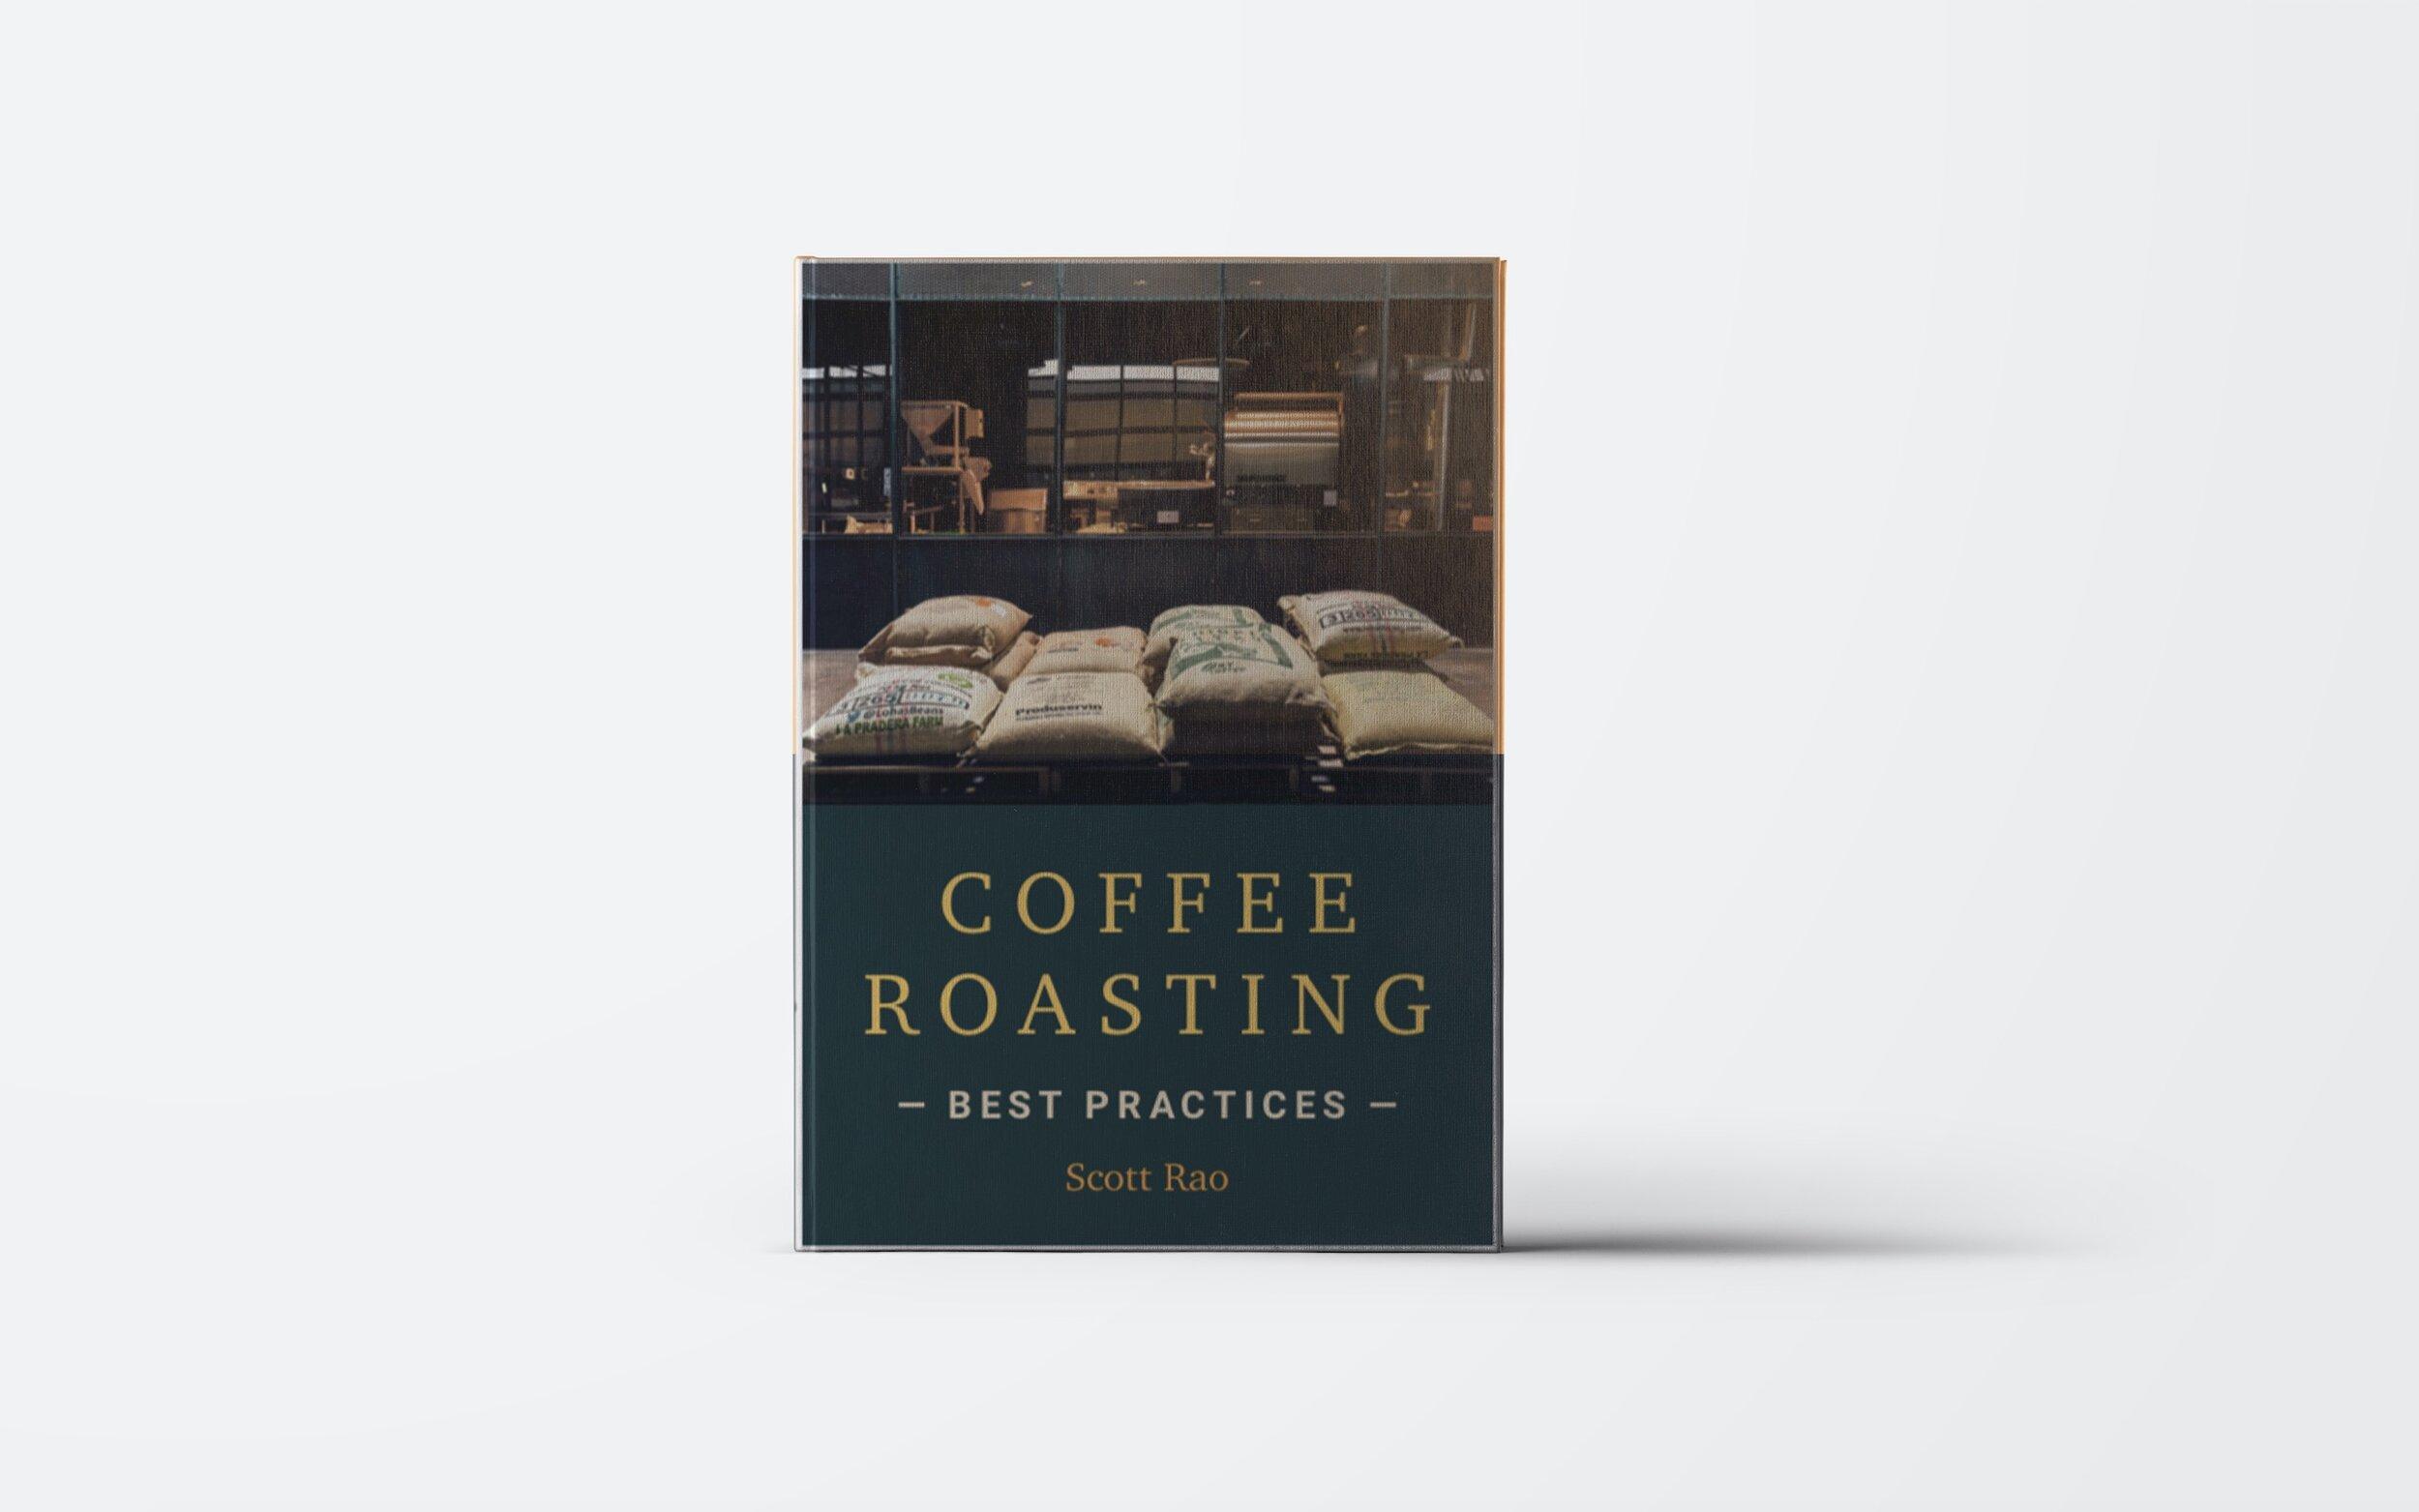 Coffee Roasting: Best Practices - Scott Rao